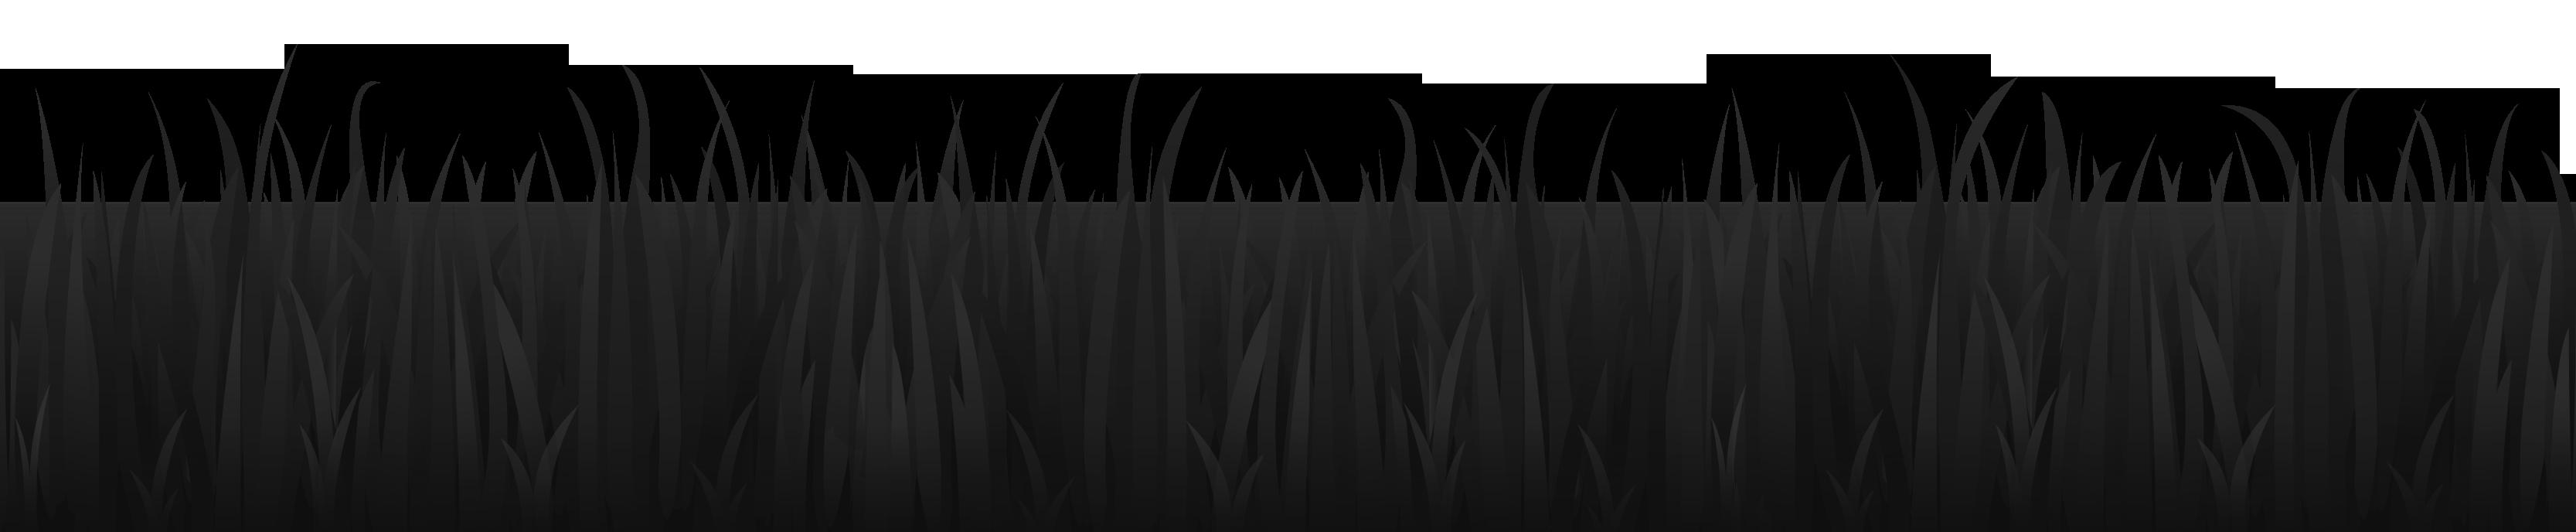 Black grass png